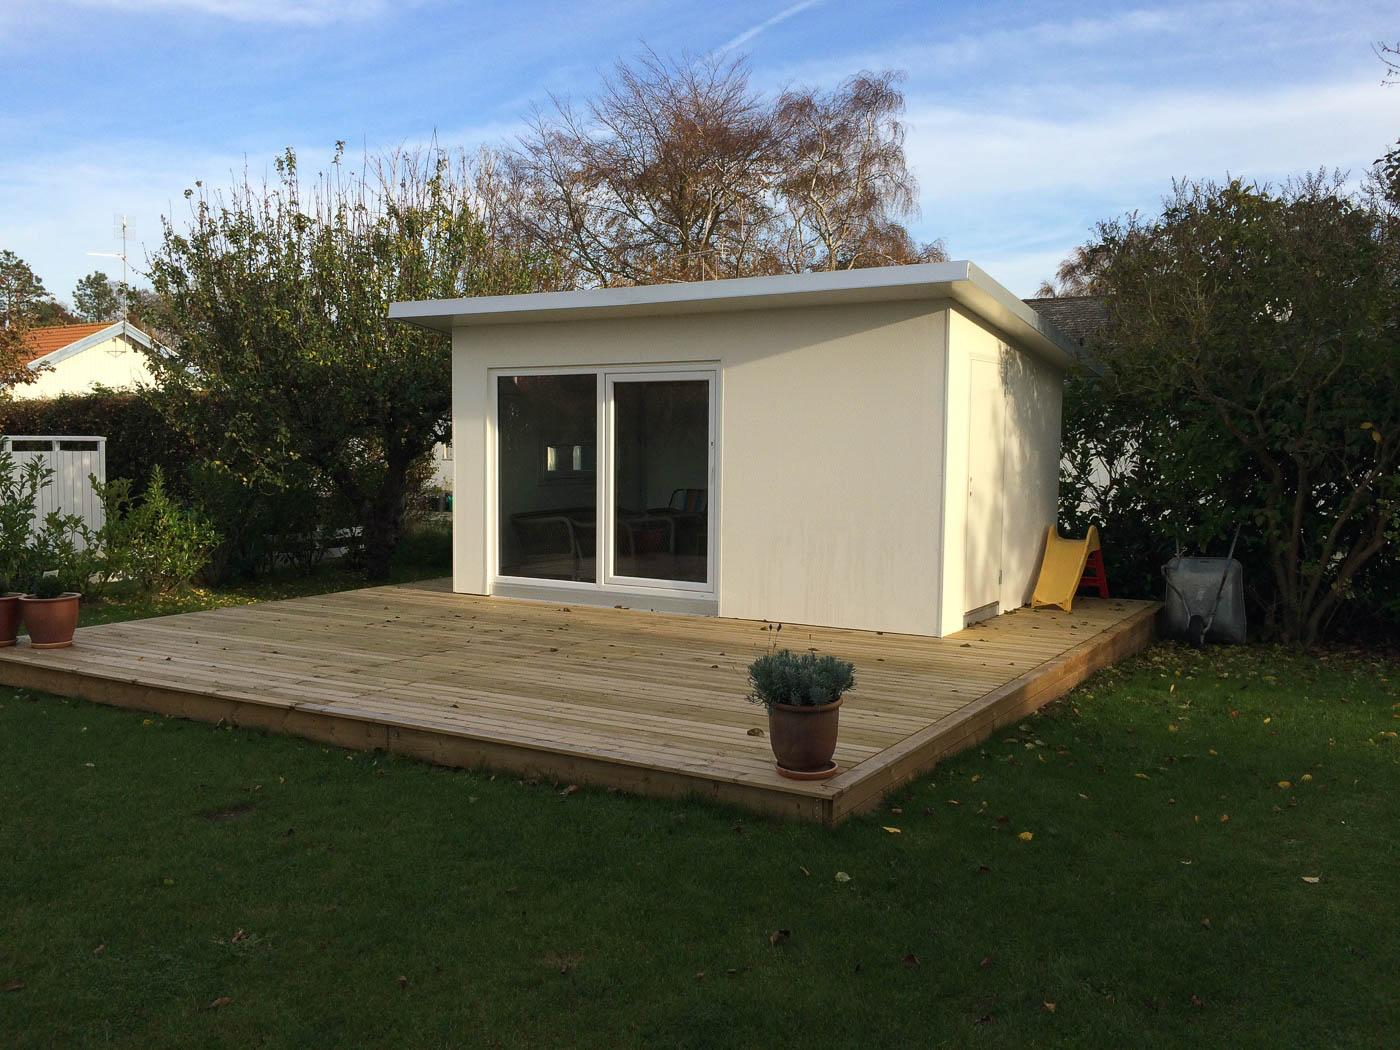 easy-house-friggebod-värmdö-15-omslagsbild